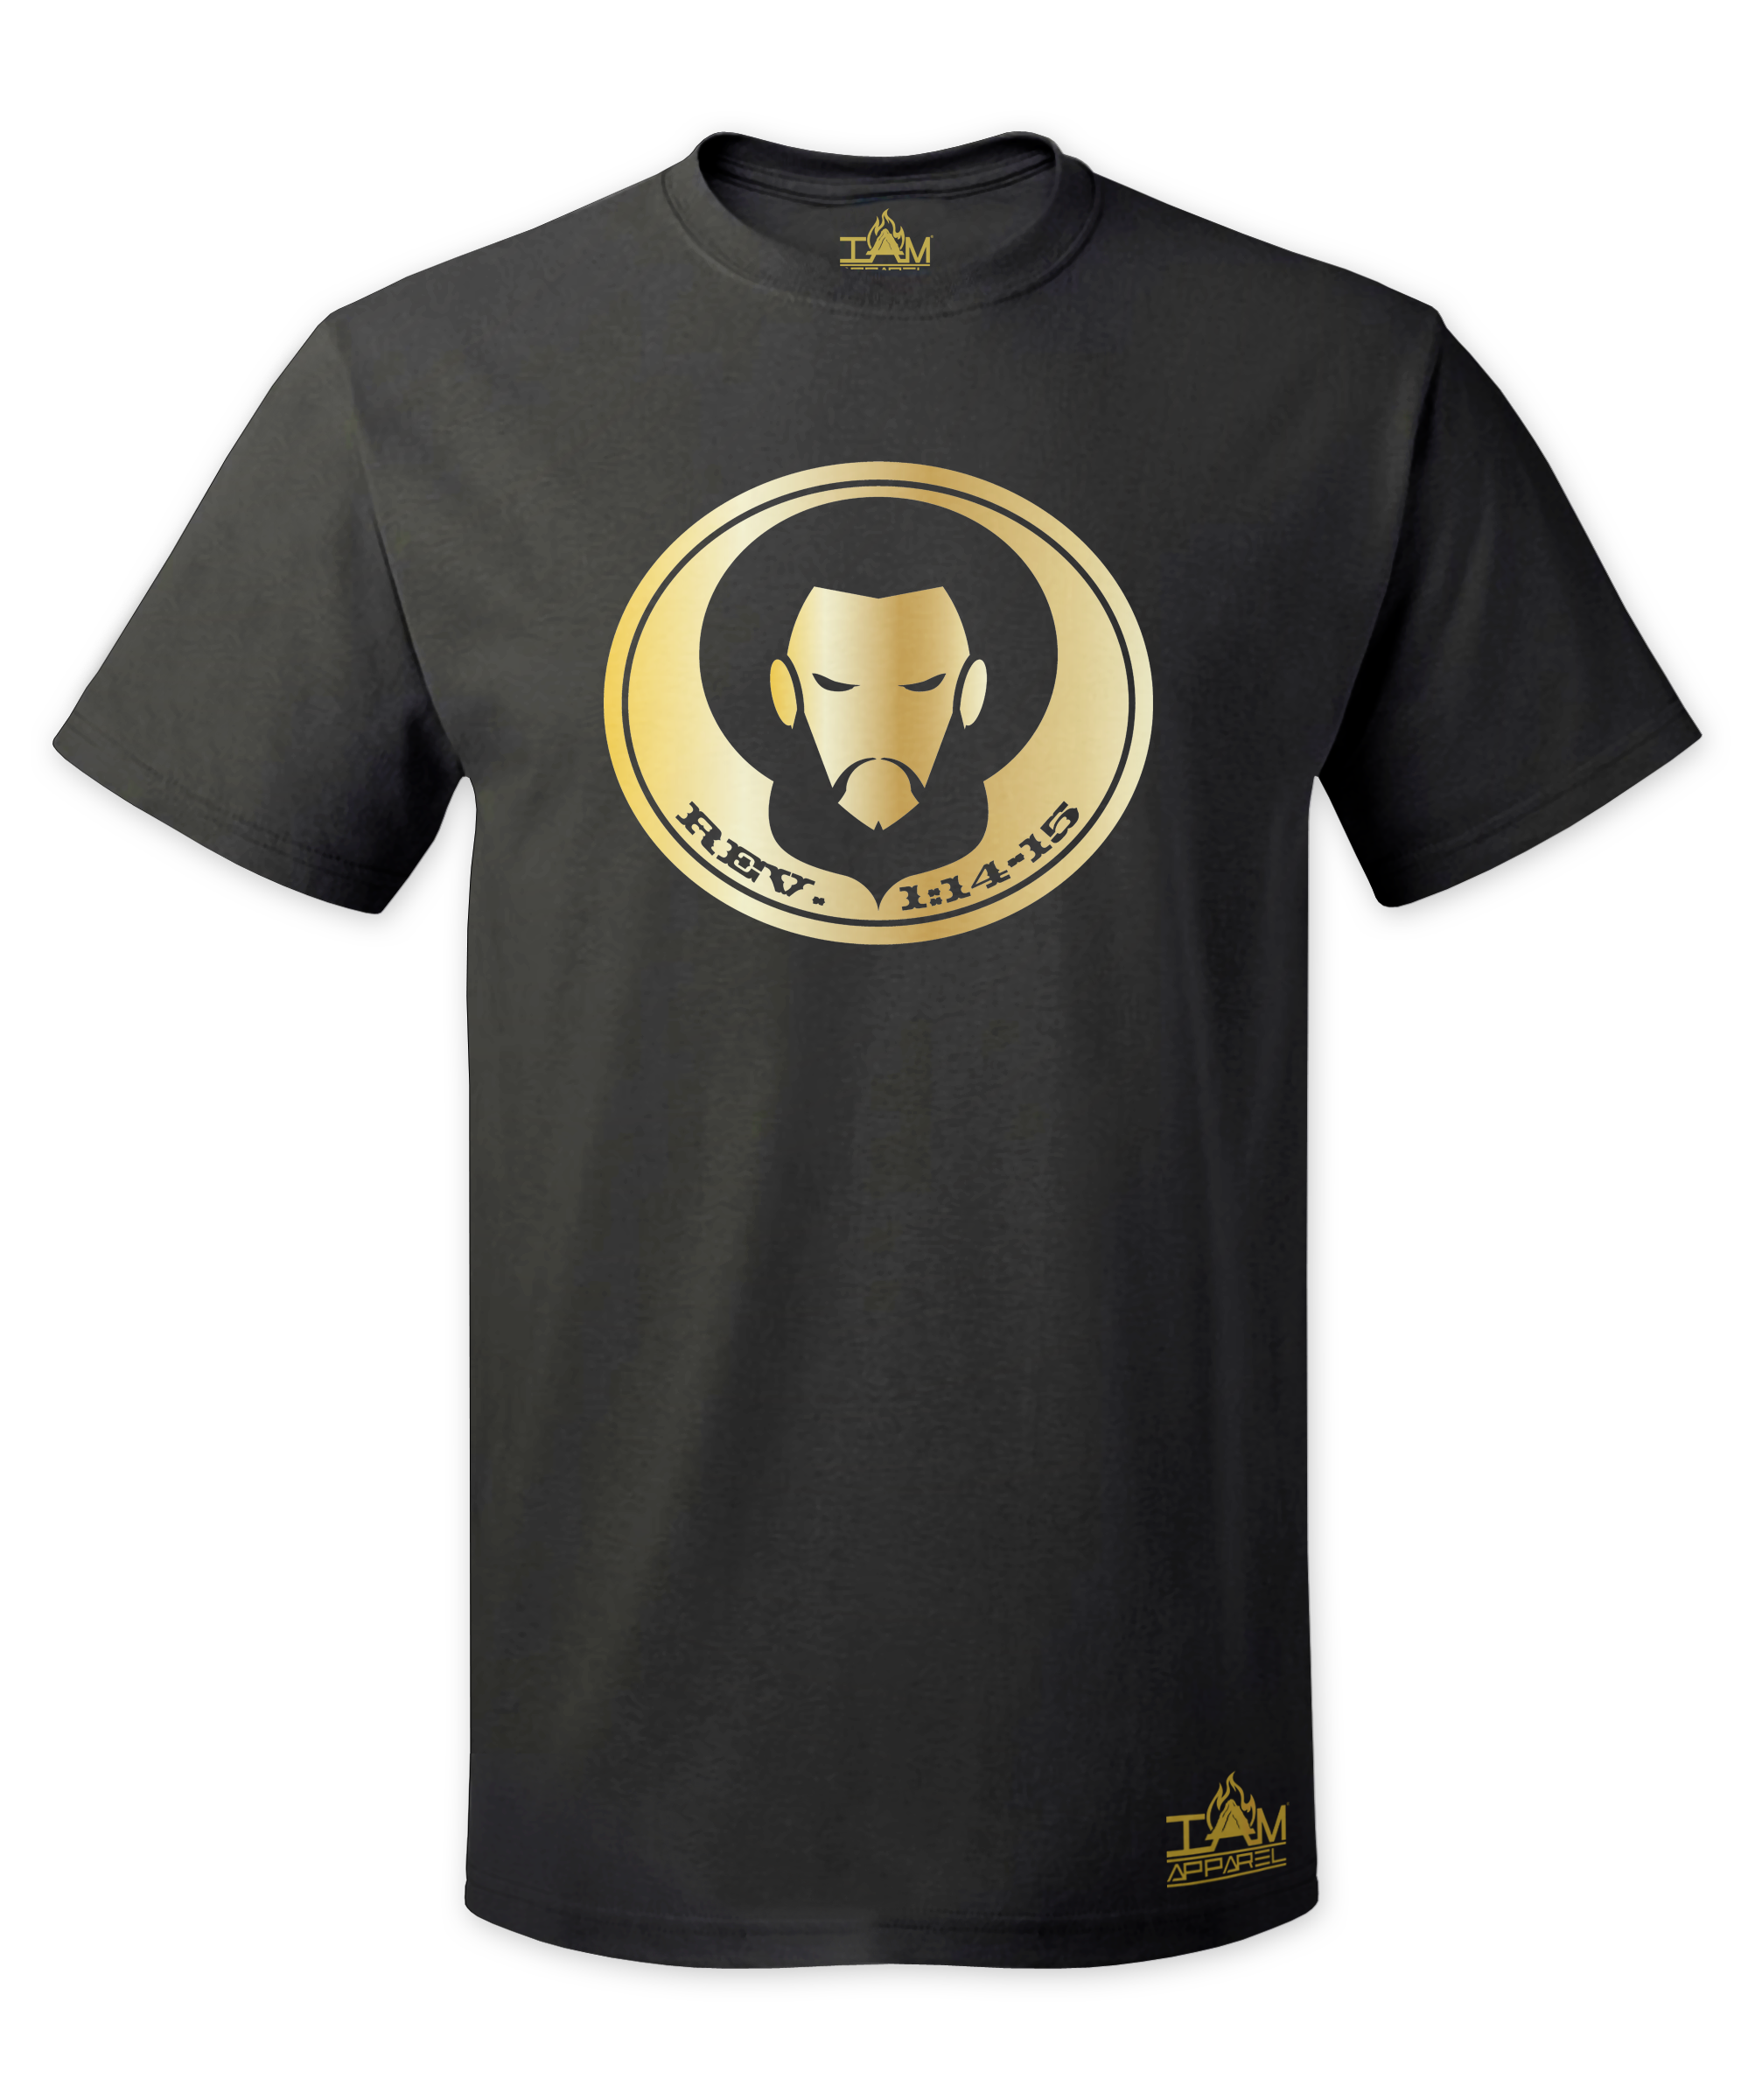 Men's GOLDEN SERIES Short Sleeved with image of Christ Black T-Shirt 00127